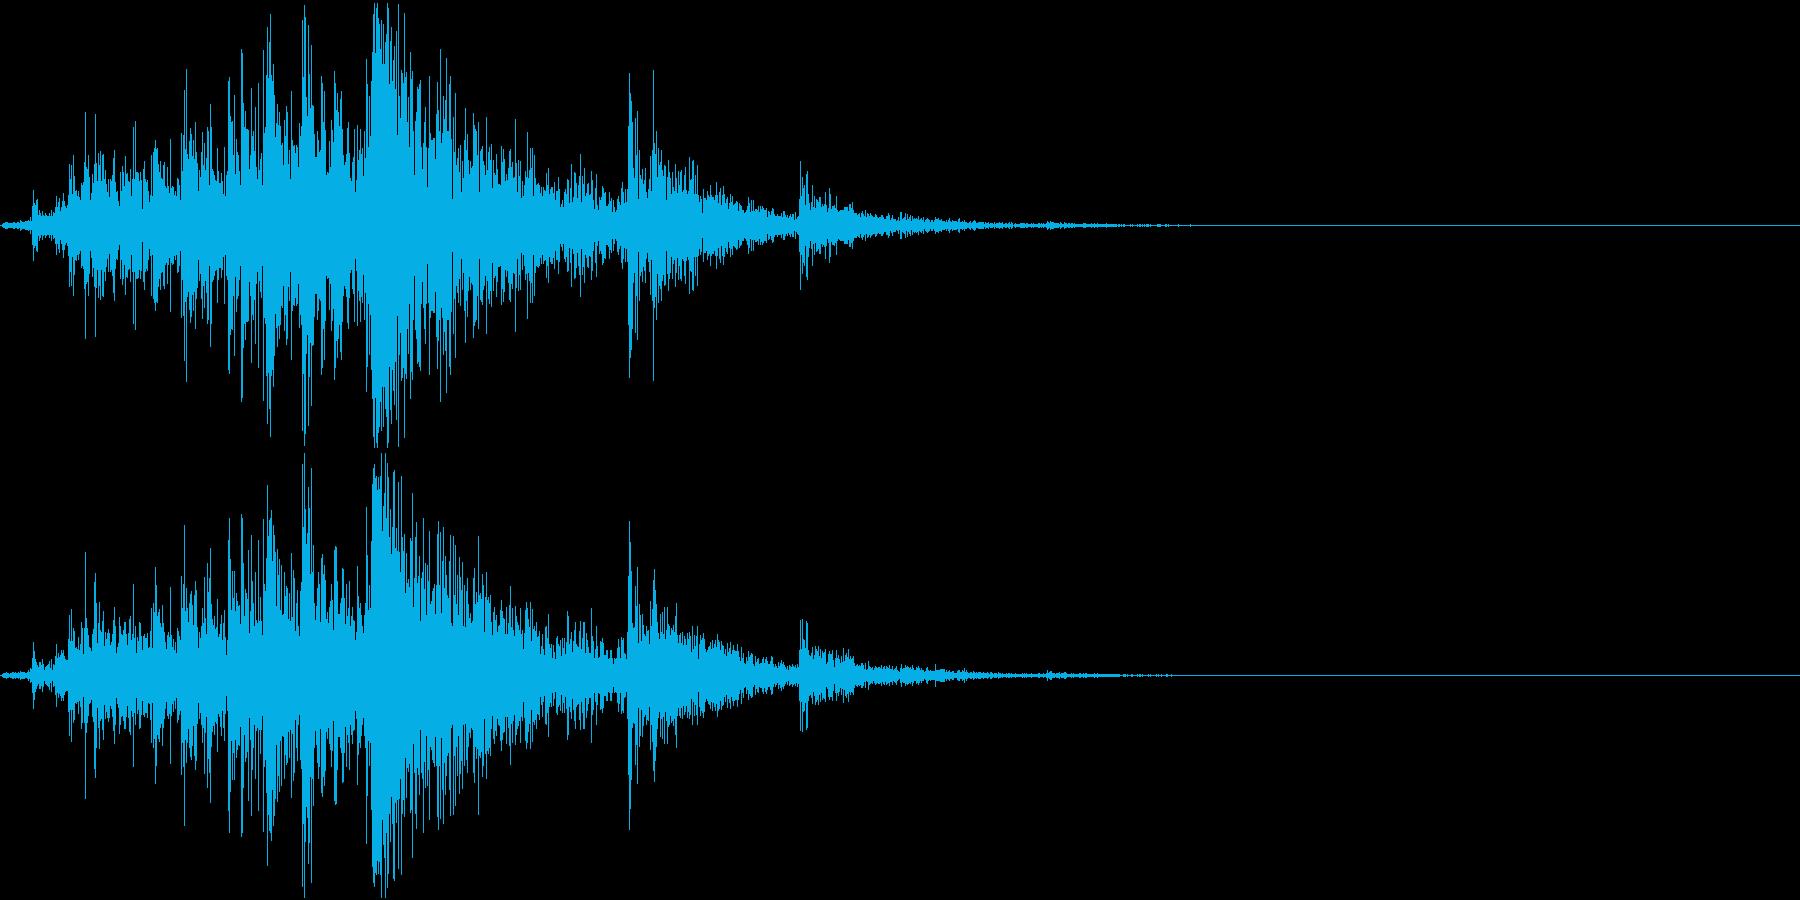 Gear 機械仕掛け・ギアの音 単発の再生済みの波形